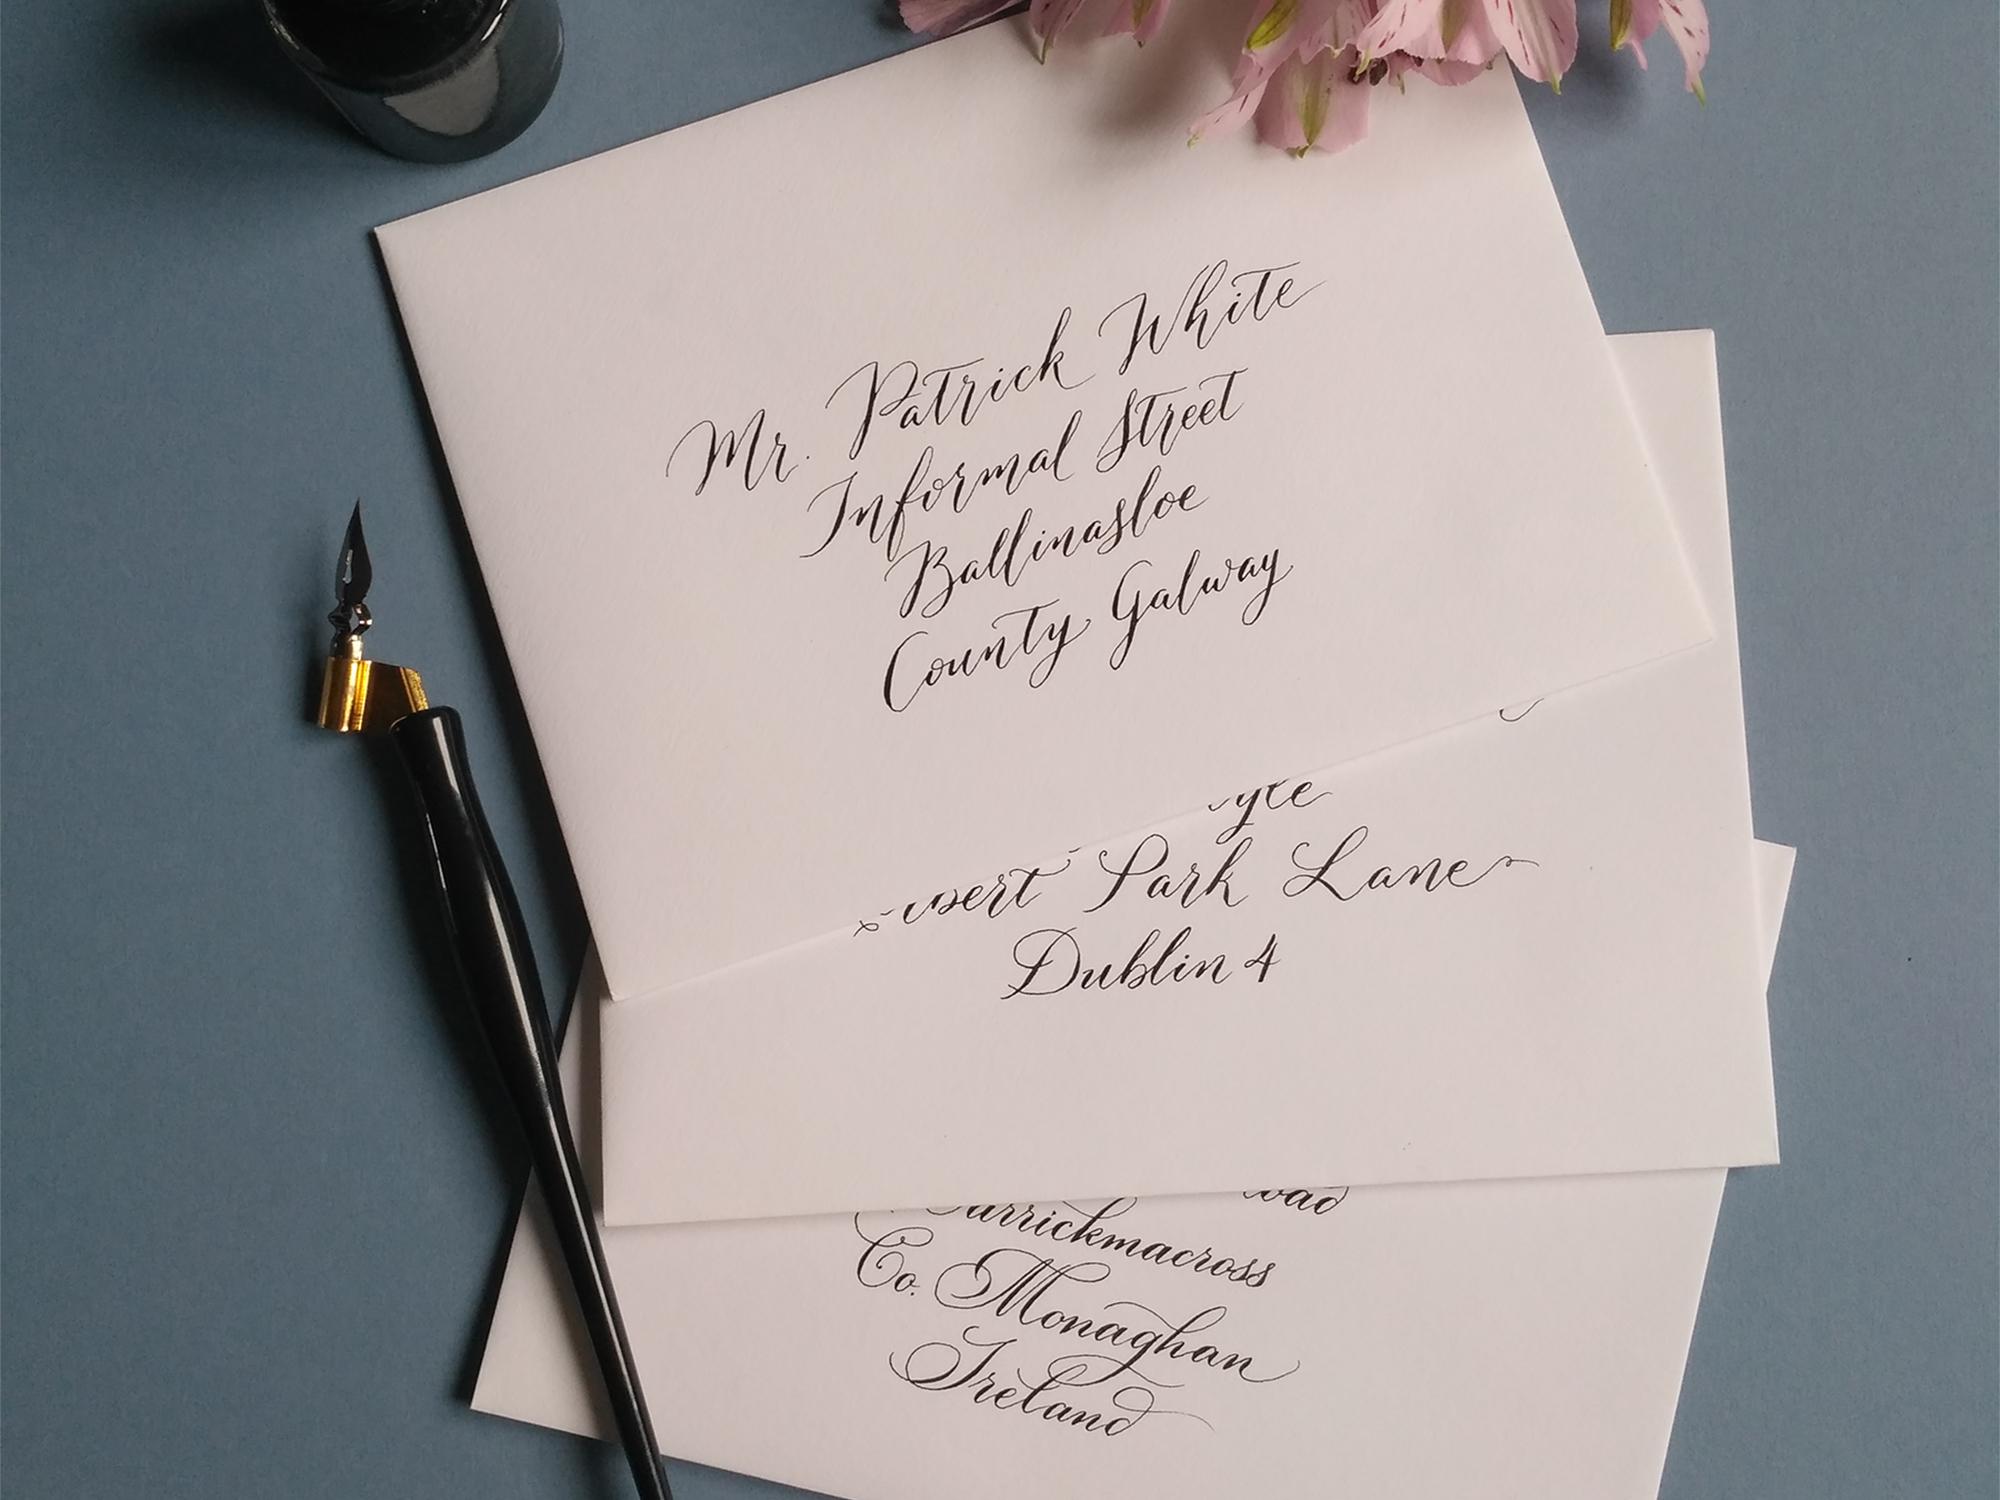 Envelope addressing, calligraphy